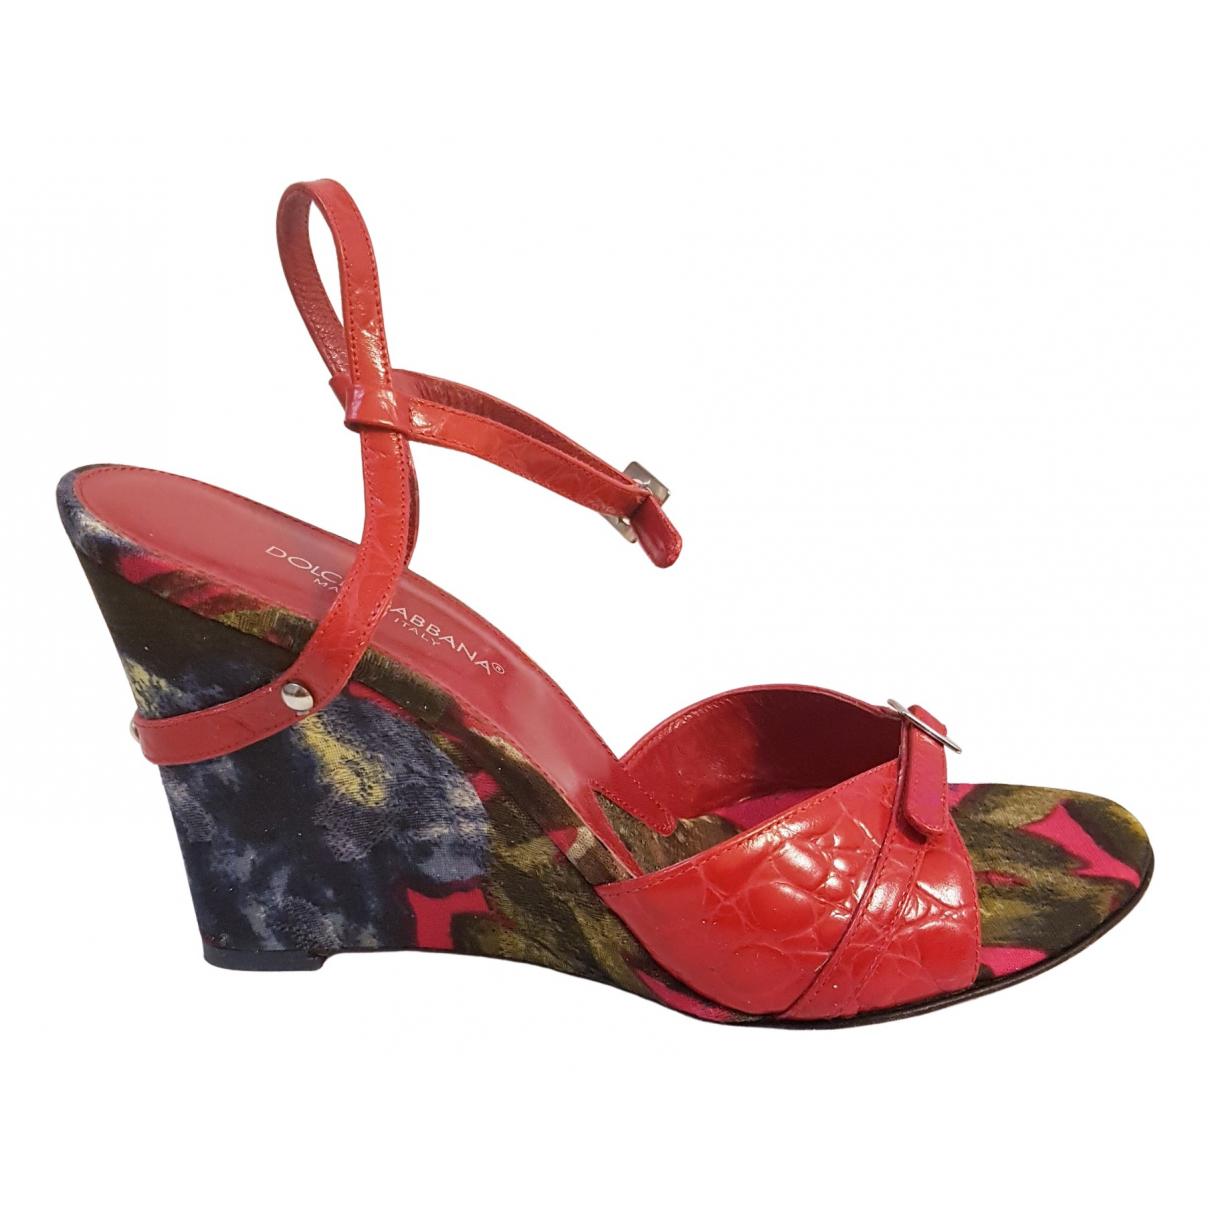 Sandalias de Cueros exoticos Dolce & Gabbana